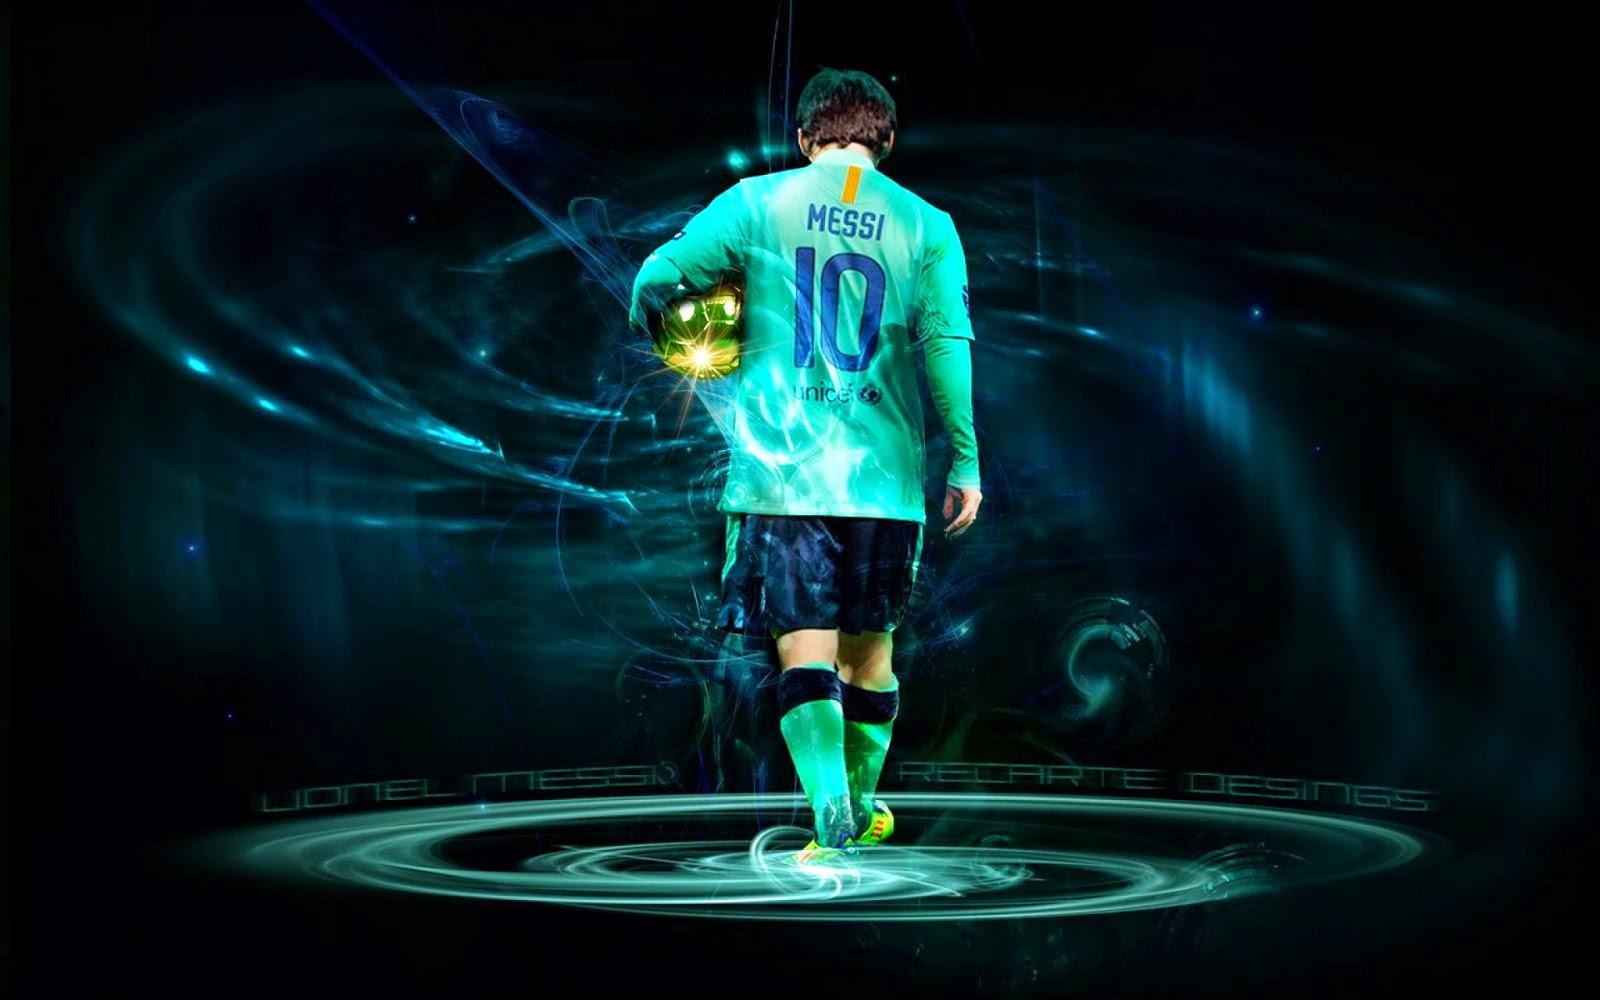 Chidas Para Fondo De Escritorio 3d: Lionel Messi: 20 Alucinantes Fondos De Pantalla Para Tu